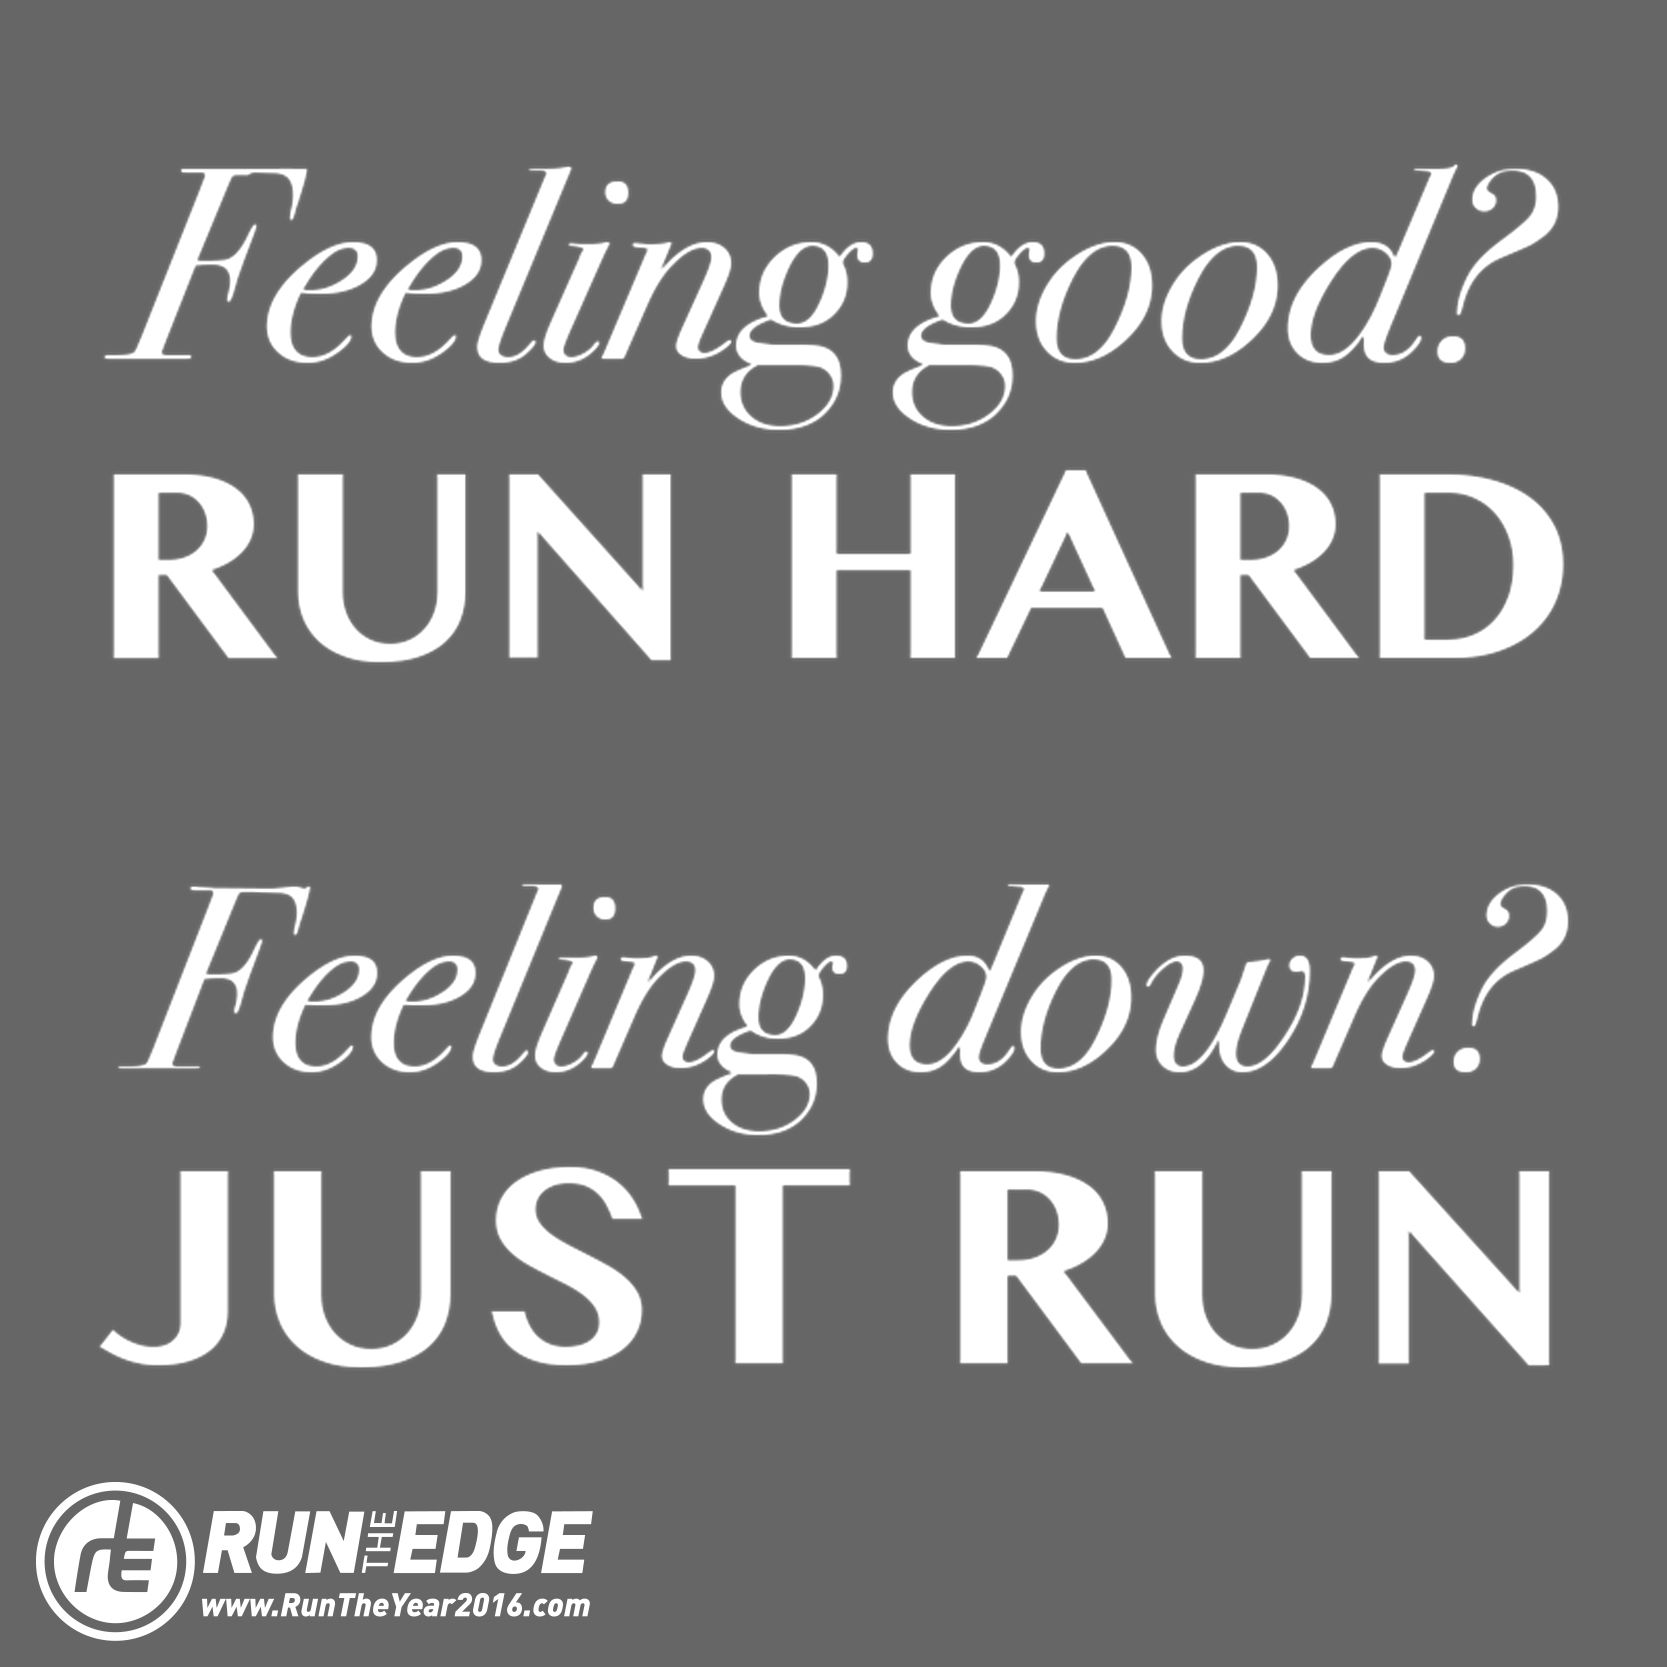 Running Quotes Motivationalquotesrunningrunnertrainingfitness